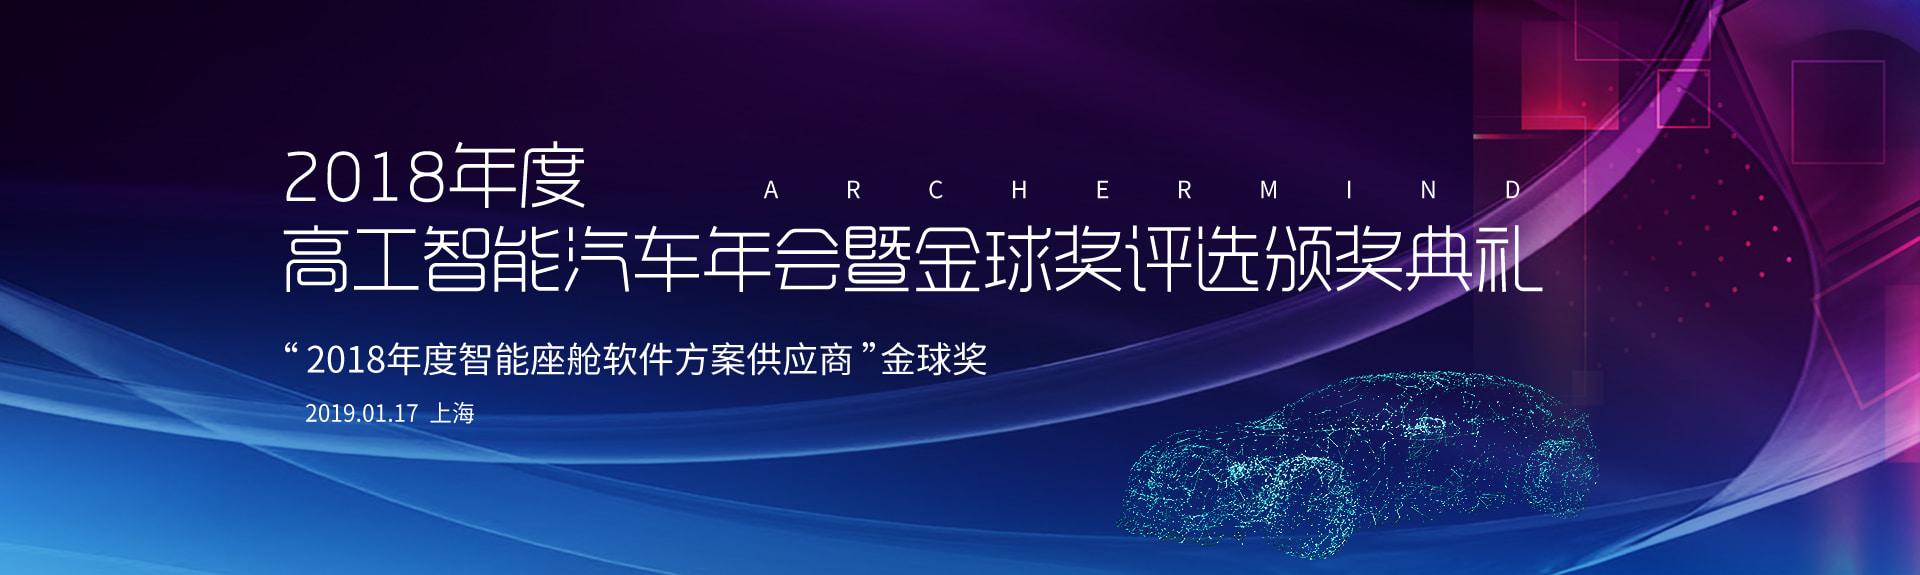 2018 gg-ii.com archermind-award